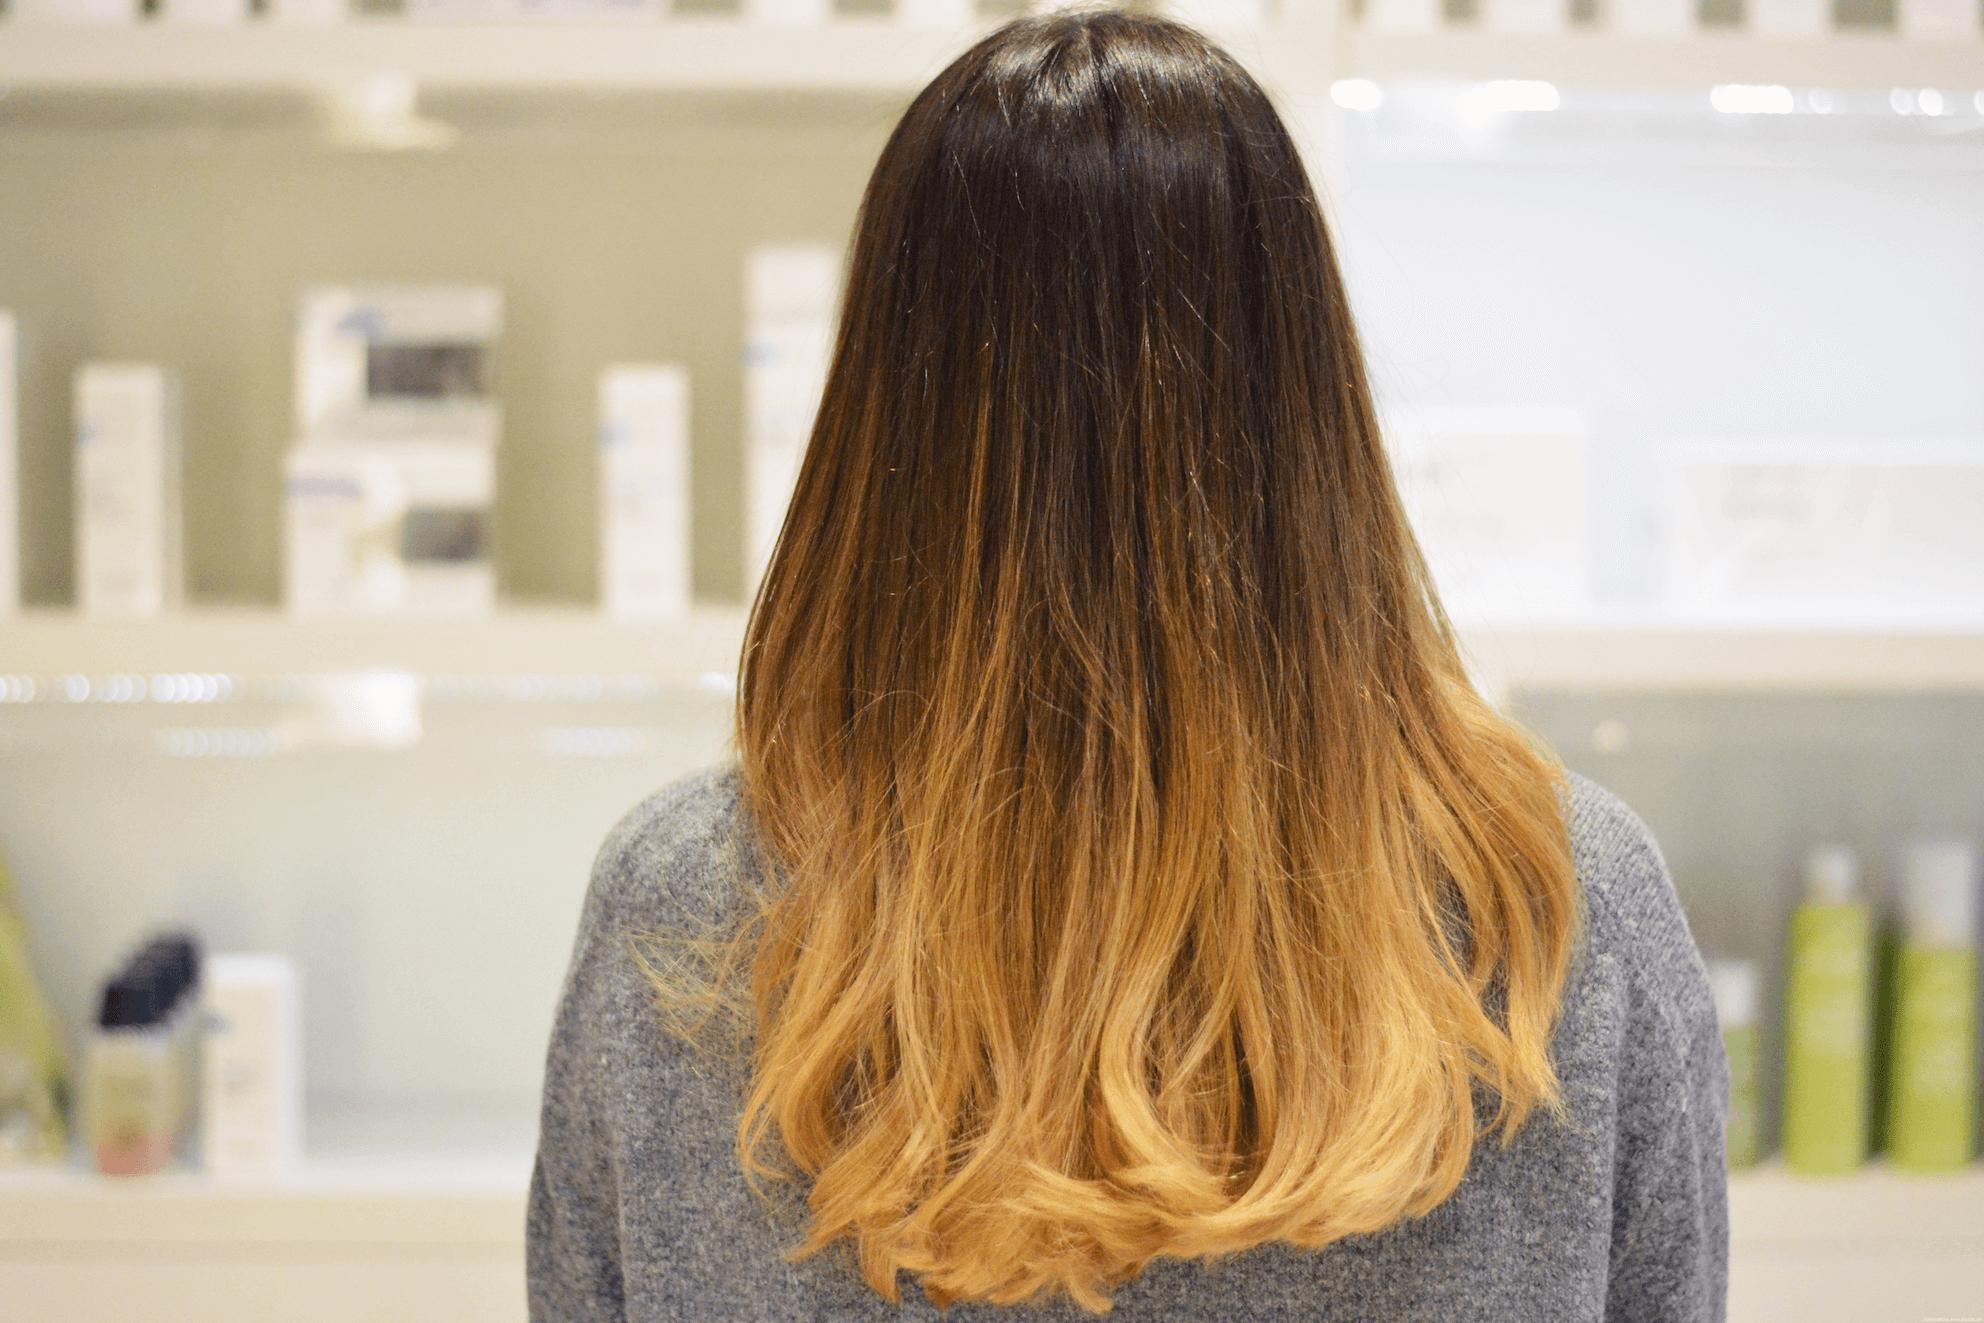 joli ombre hair blog les caprices d iris